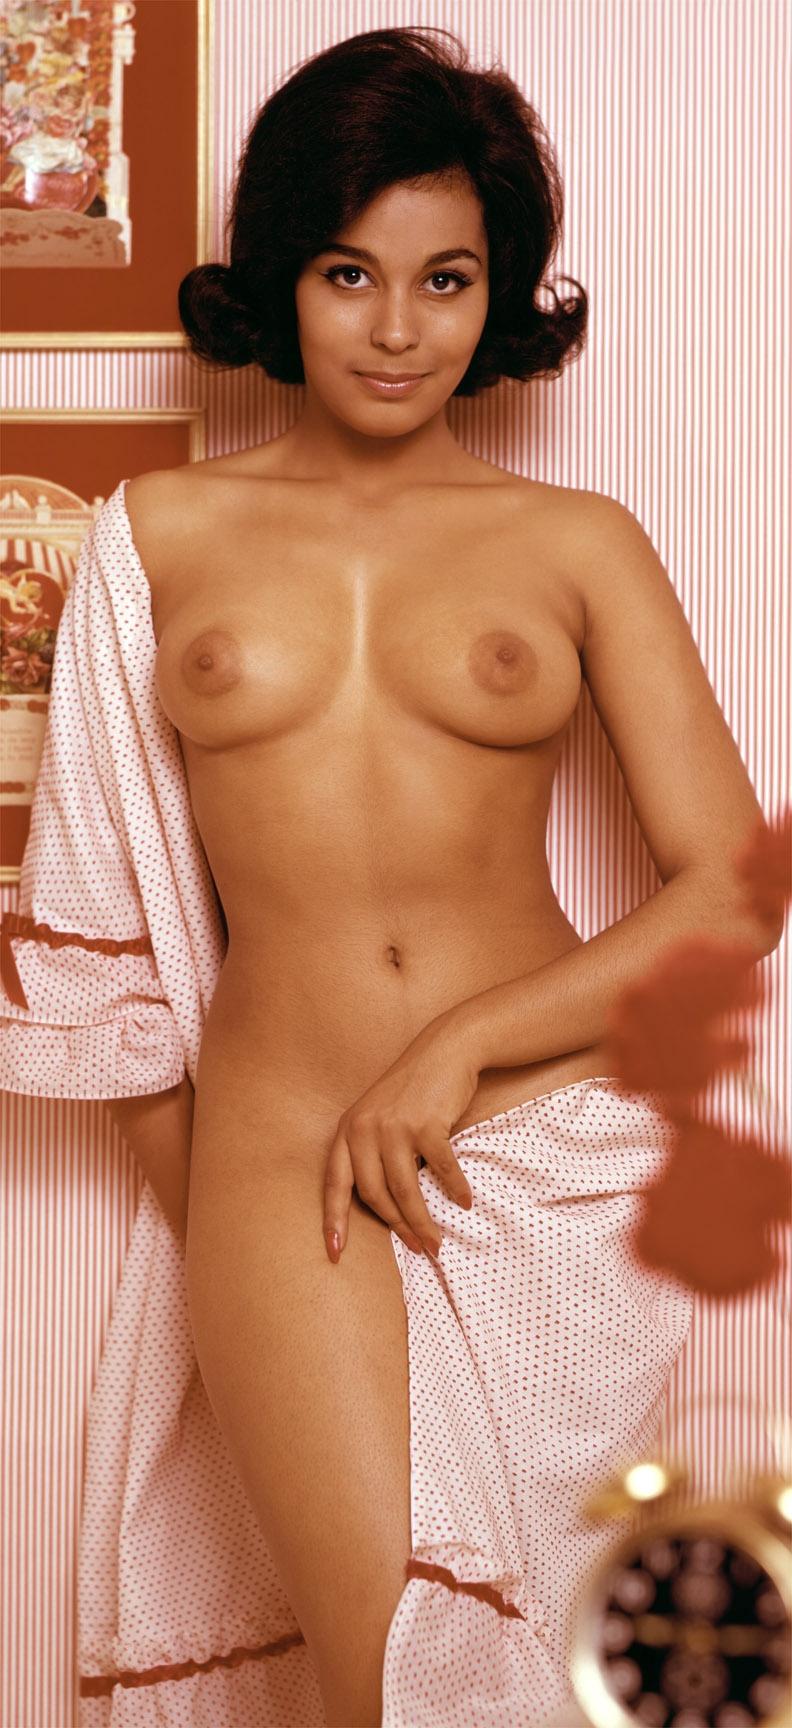 Nude lake jackson, nude girl bangla image